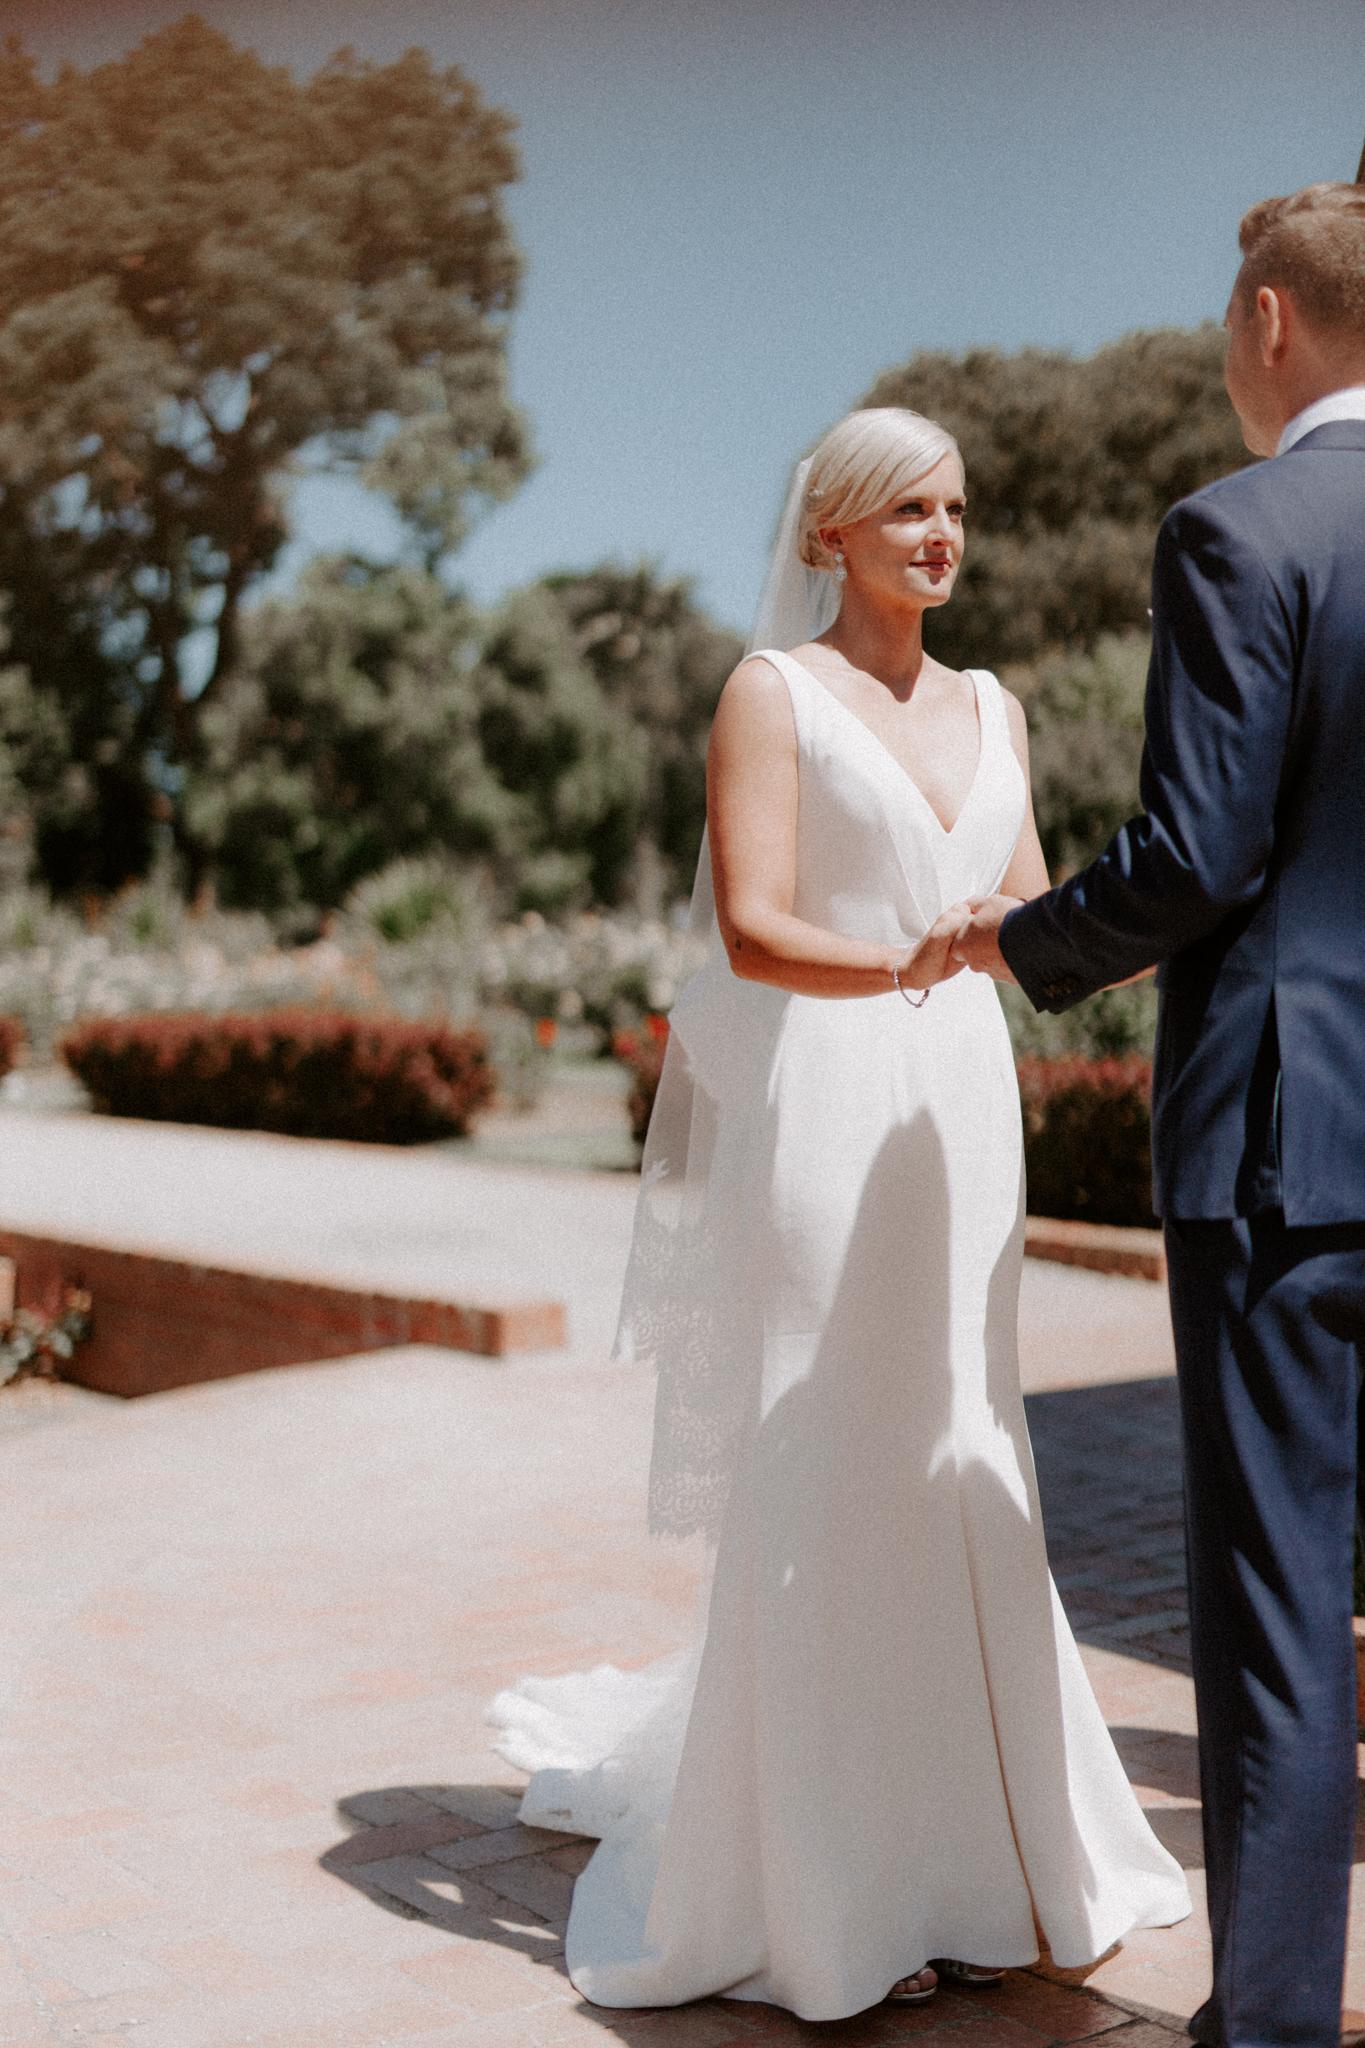 St-Kilda-Garden-Wedding-Emotions-and-Math-Photograph-053.jpg